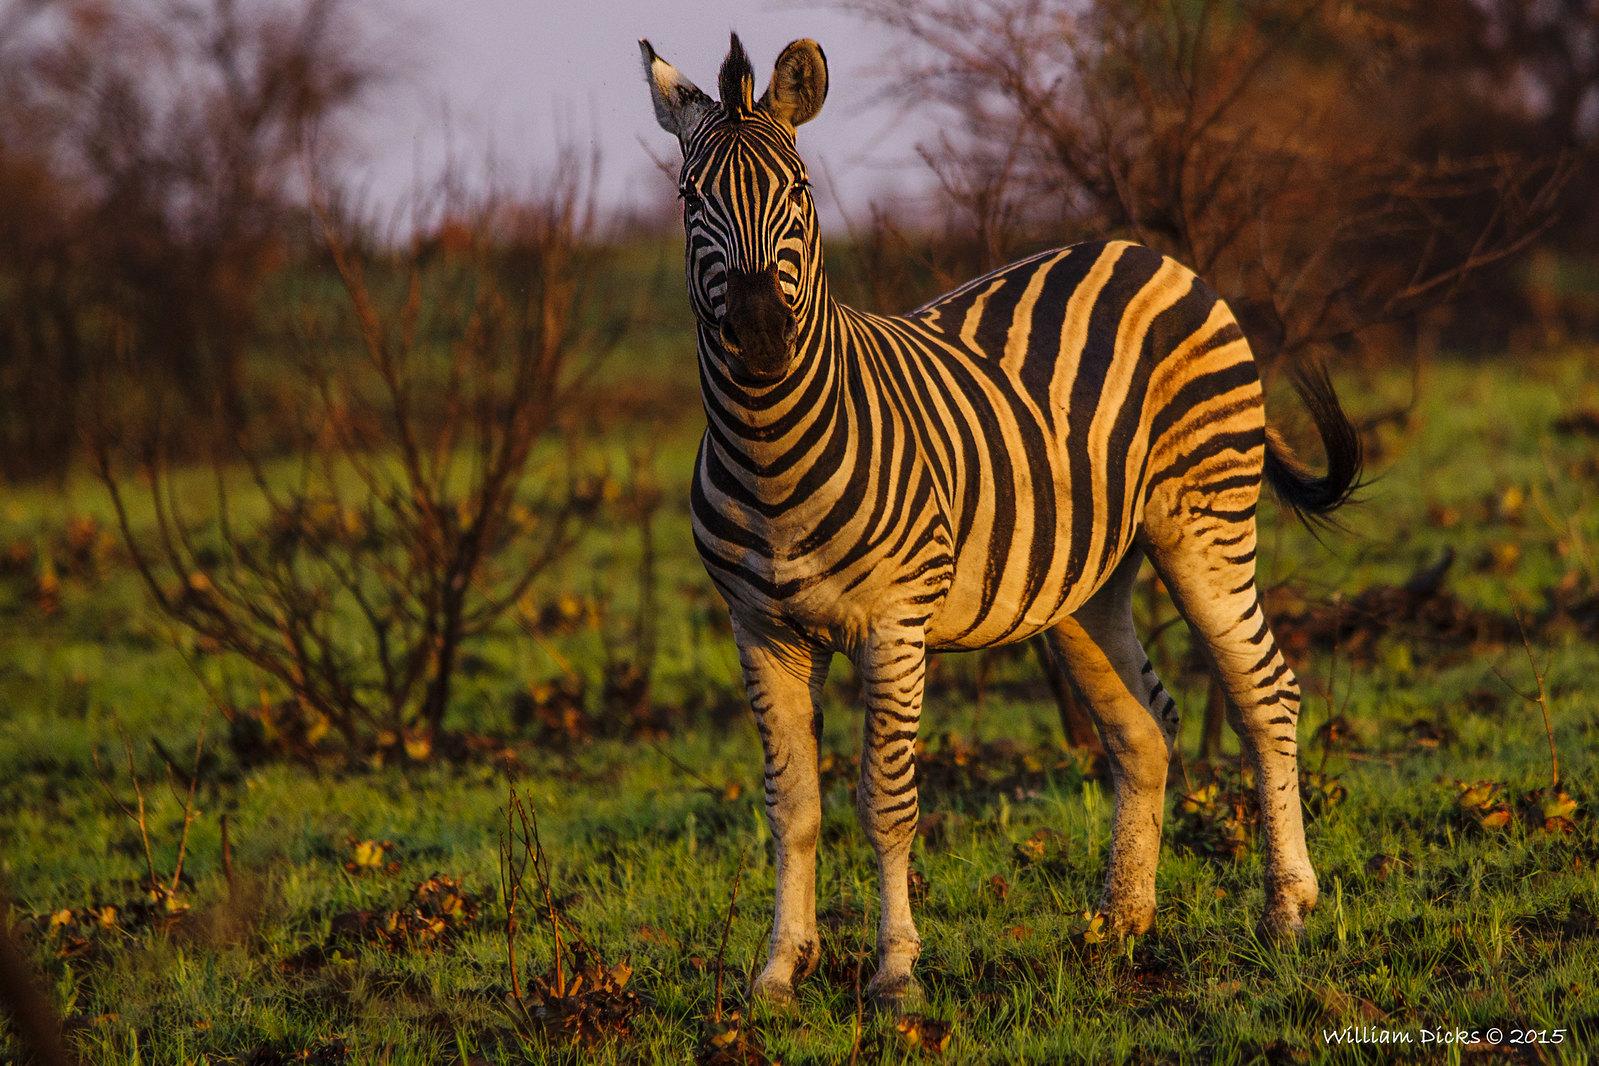 Another watching zebra